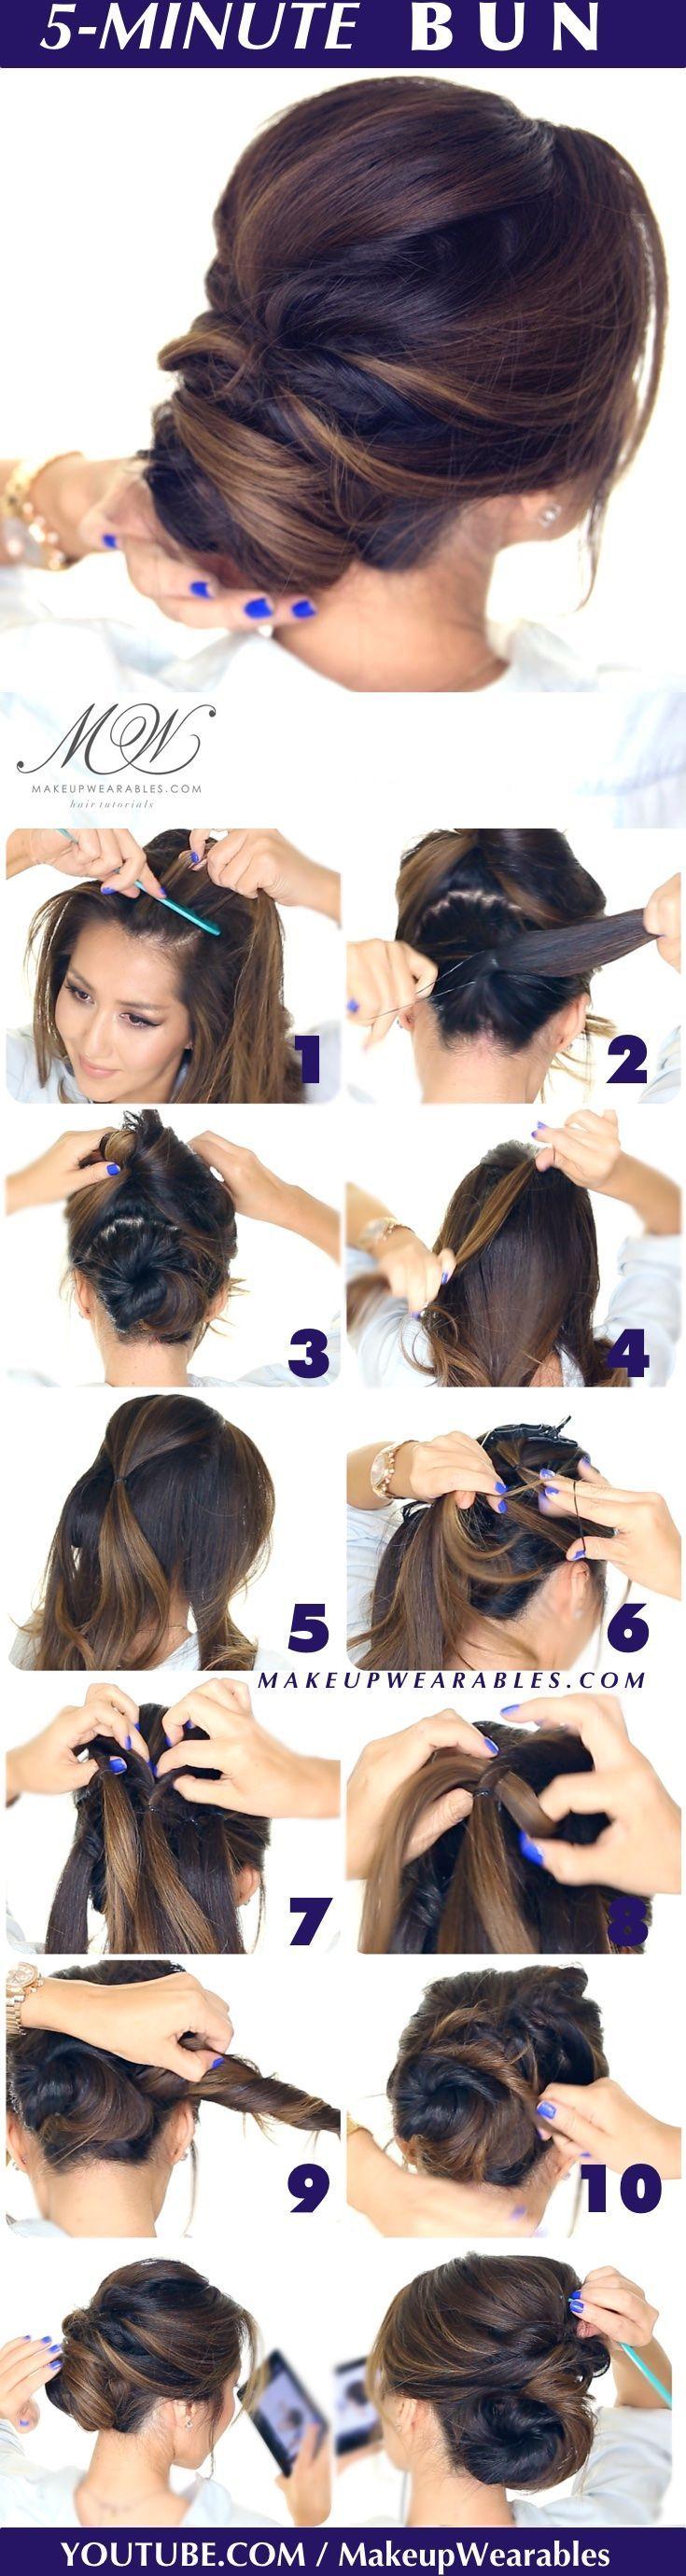 5-Minute Elegant Bun Tutorial #hairstyles #fall #styles #updos